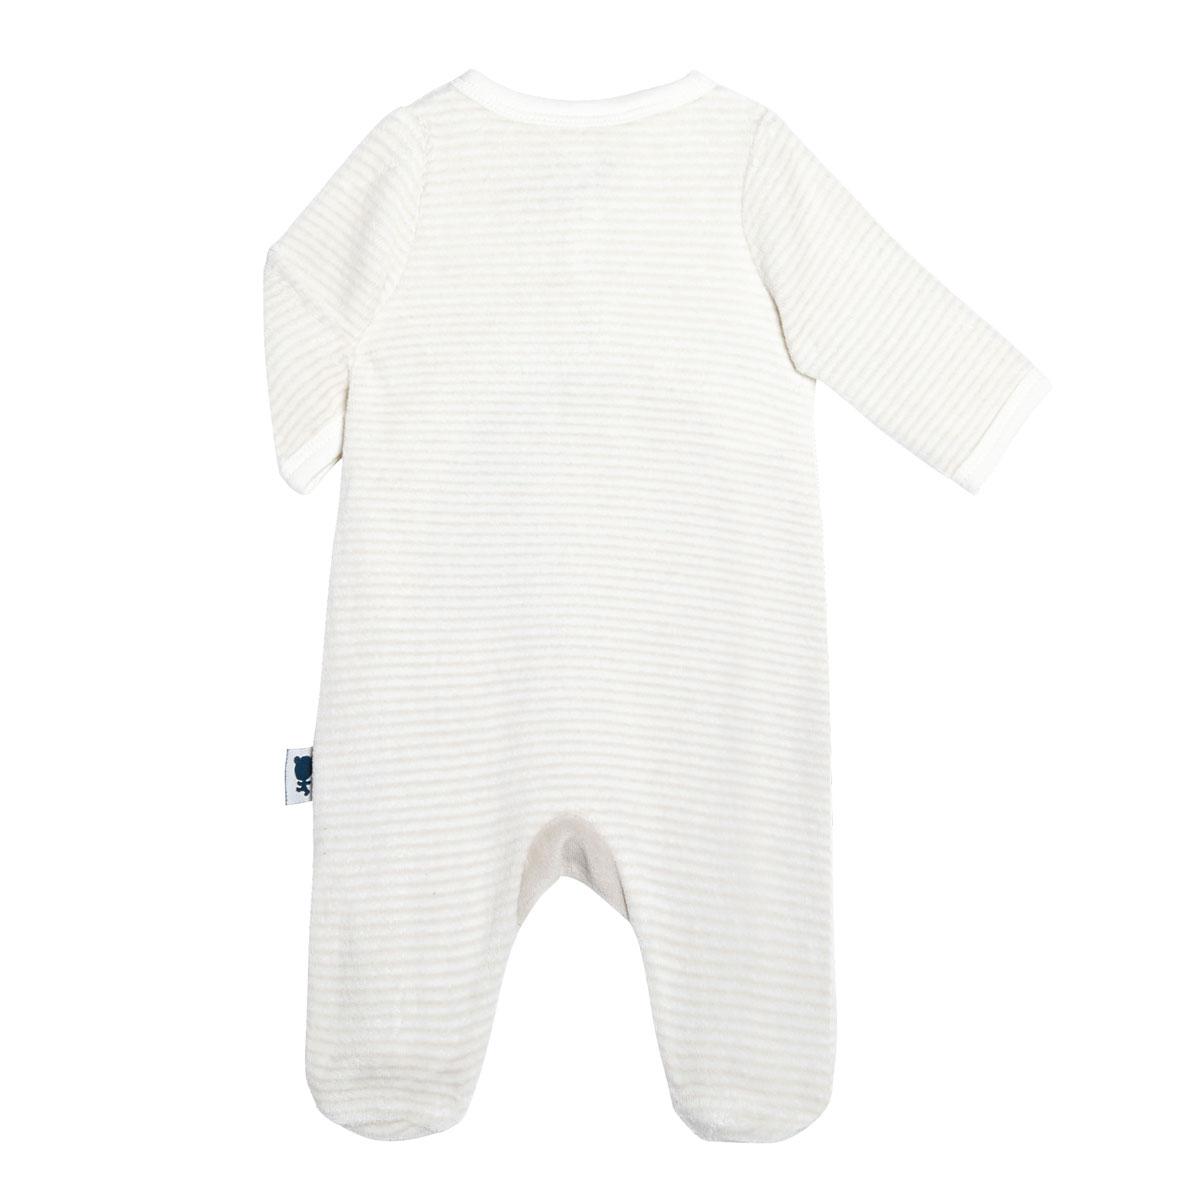 Pyjama bébé velours mixte Petite Plume dos